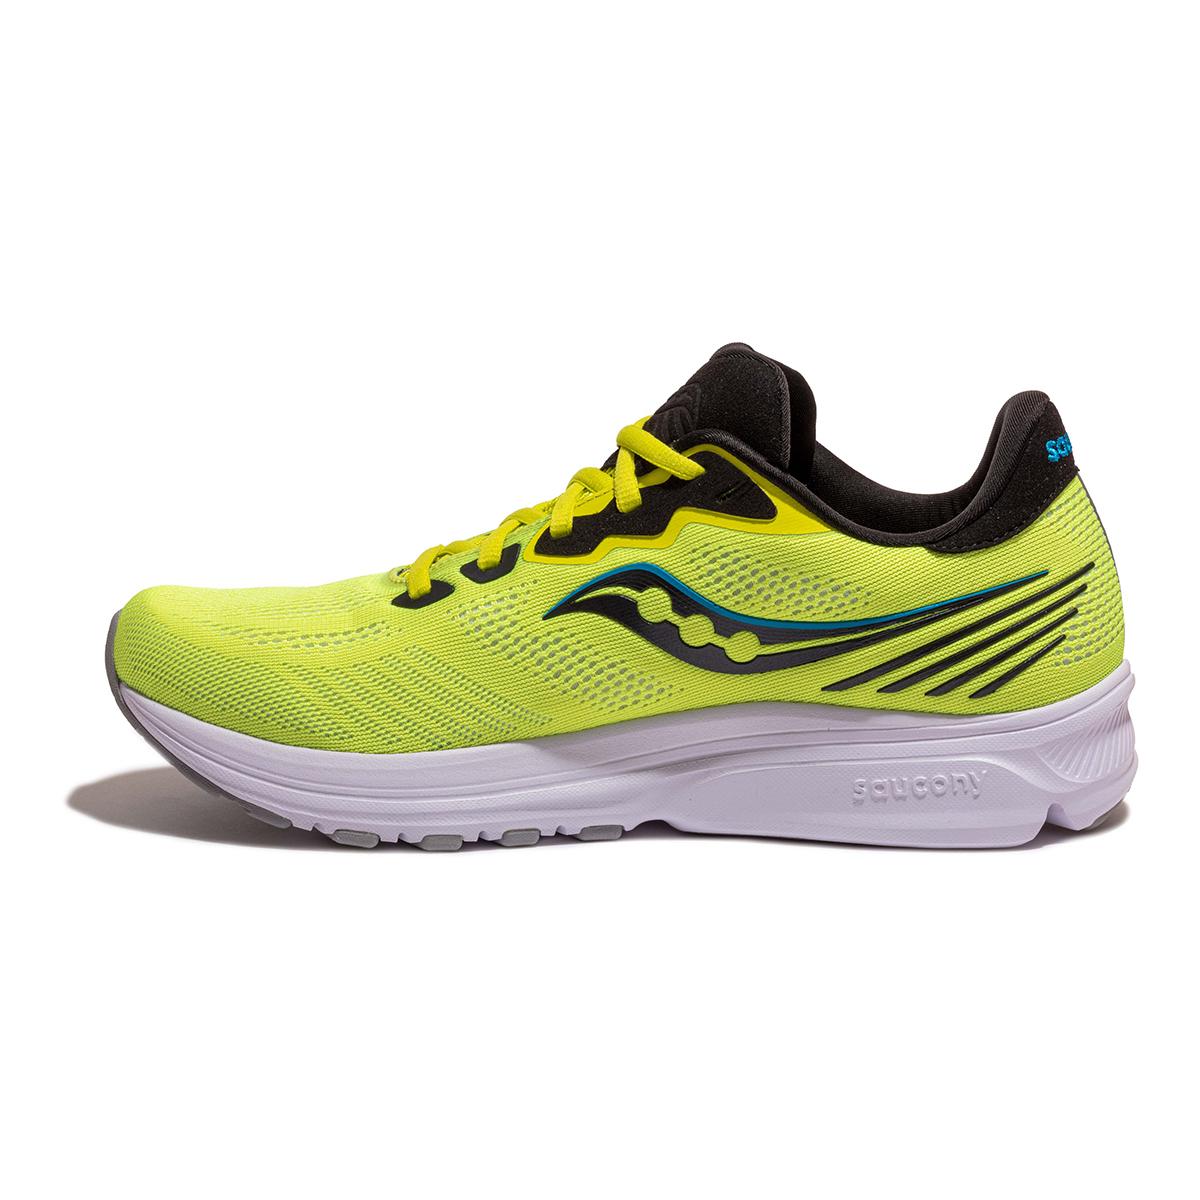 Men's Saucony Ride 14 Running Shoe - Color: Citrus / Black - Size: 7 - Width: Regular, Citrus / Black, large, image 2